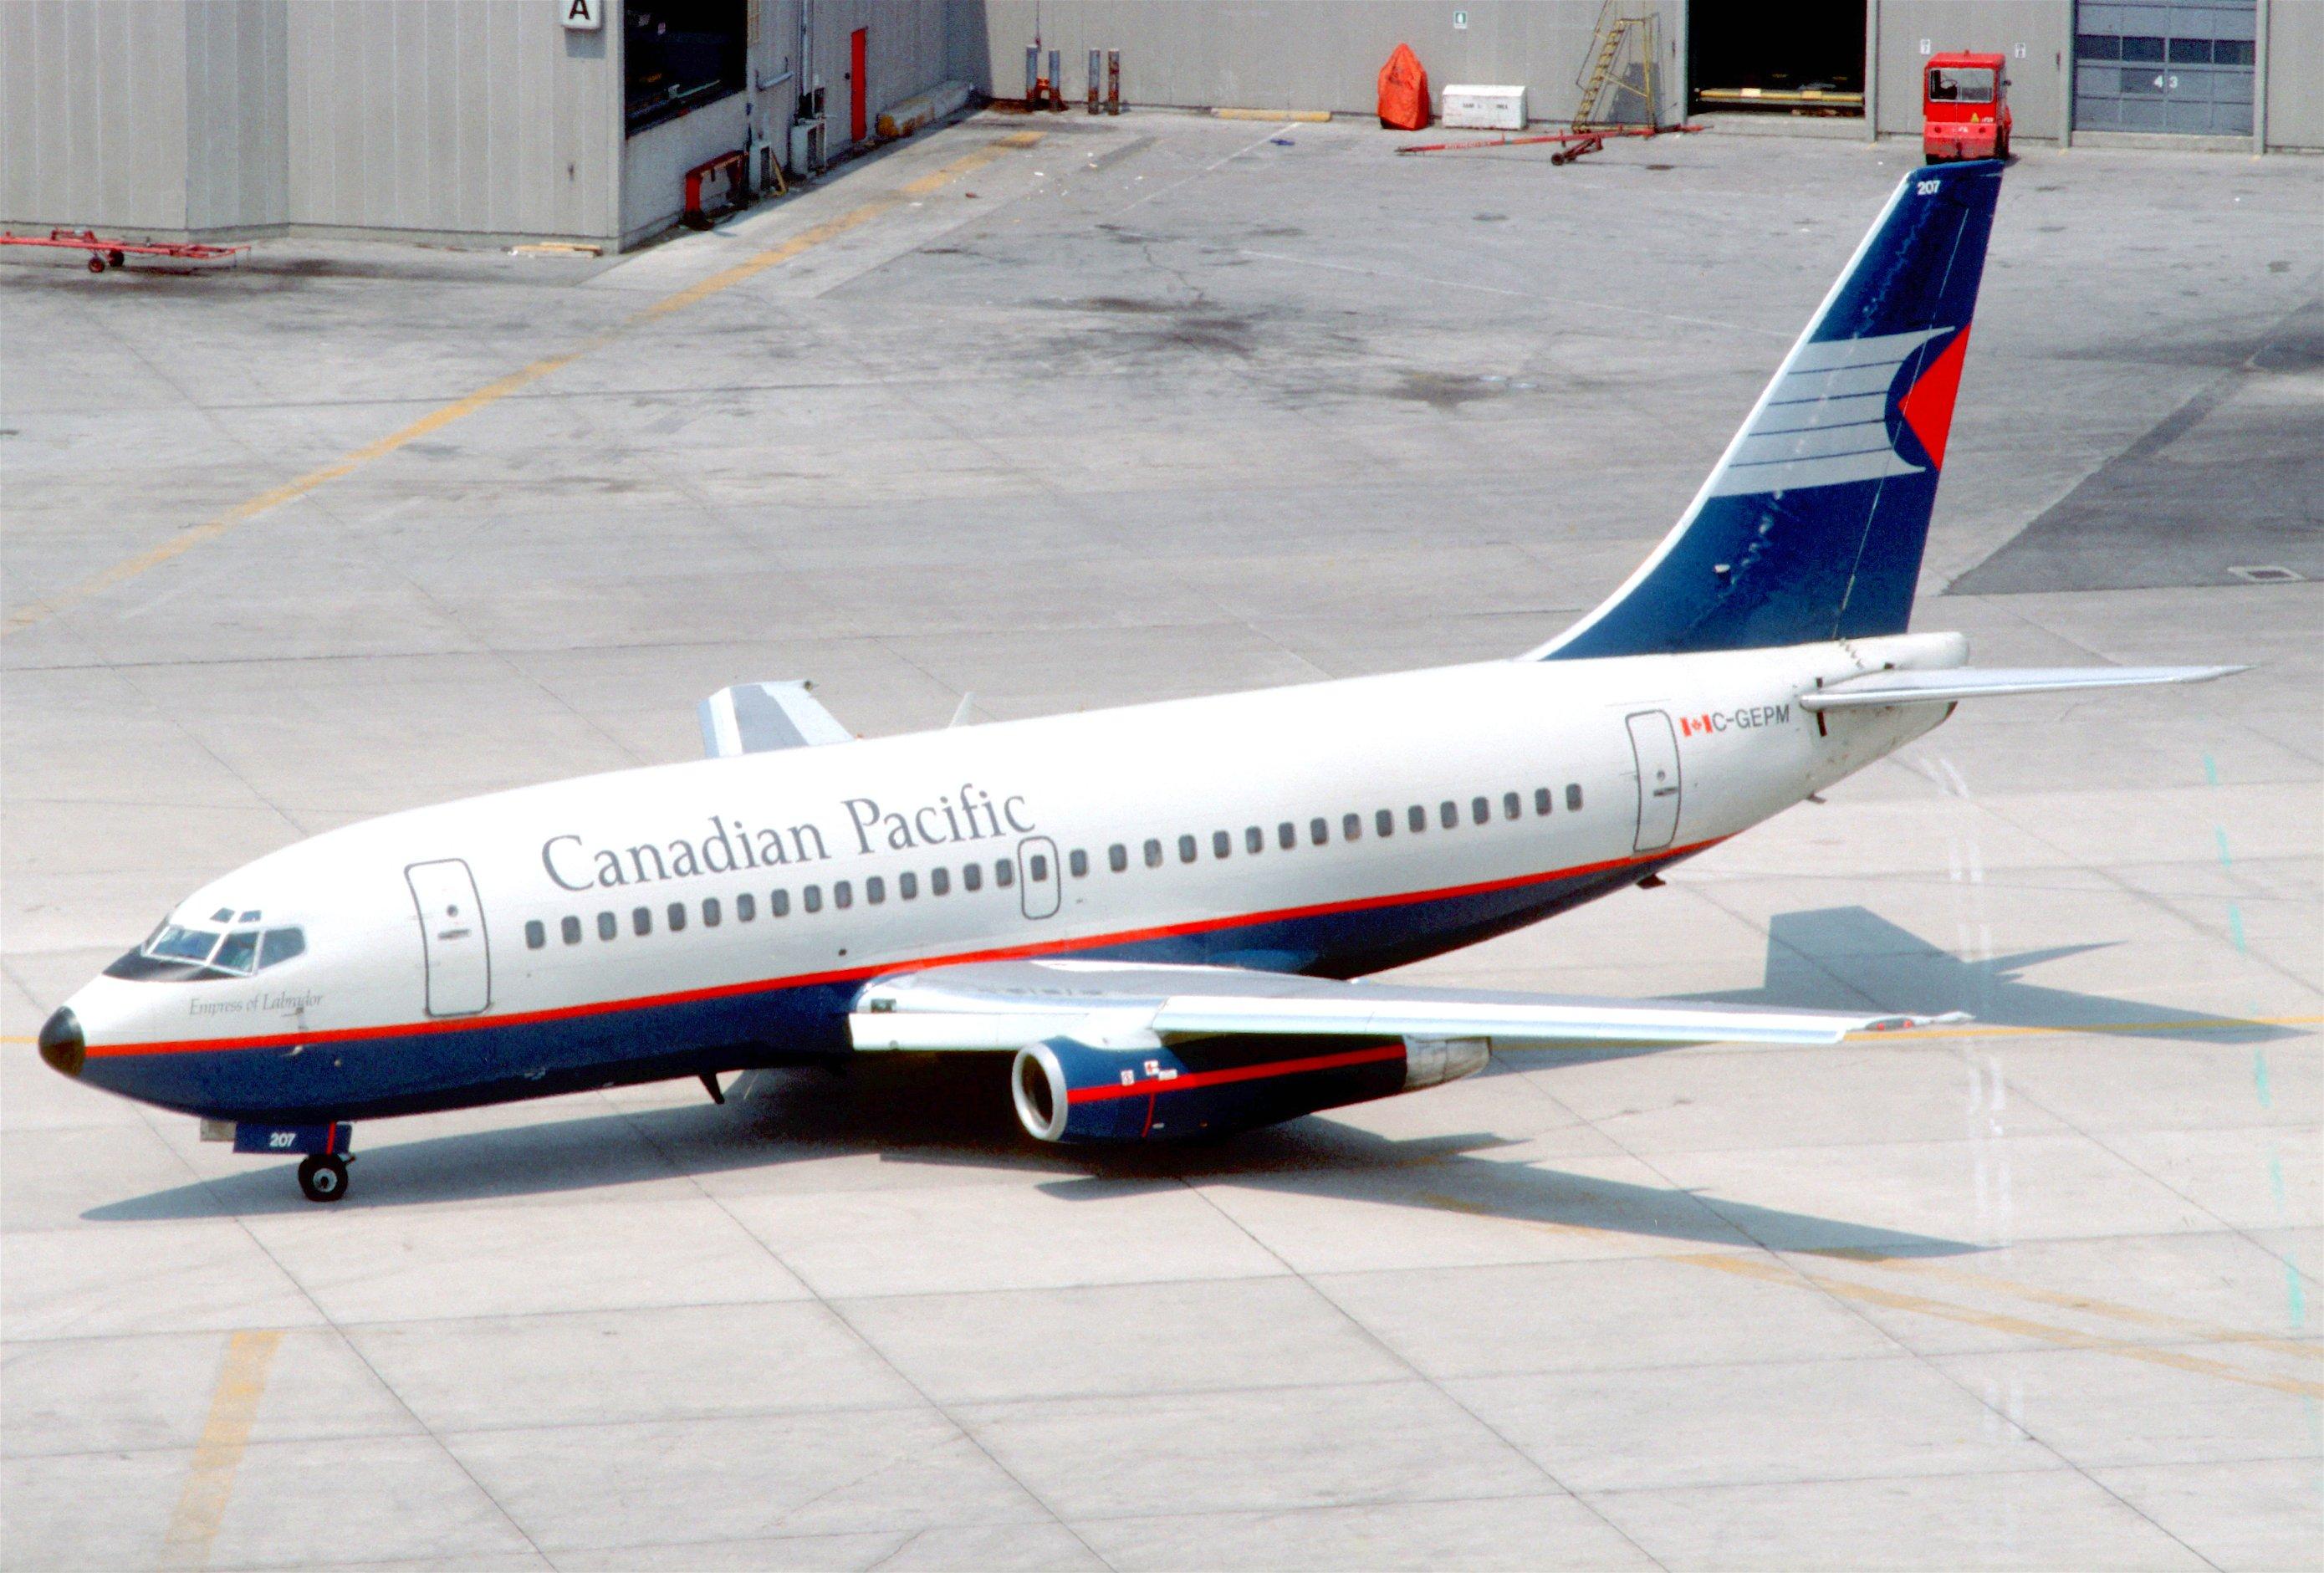 file canadian pacific airlines boeing 737 2t5 c gepm june 1986 bat 5288914314 jpg. Black Bedroom Furniture Sets. Home Design Ideas